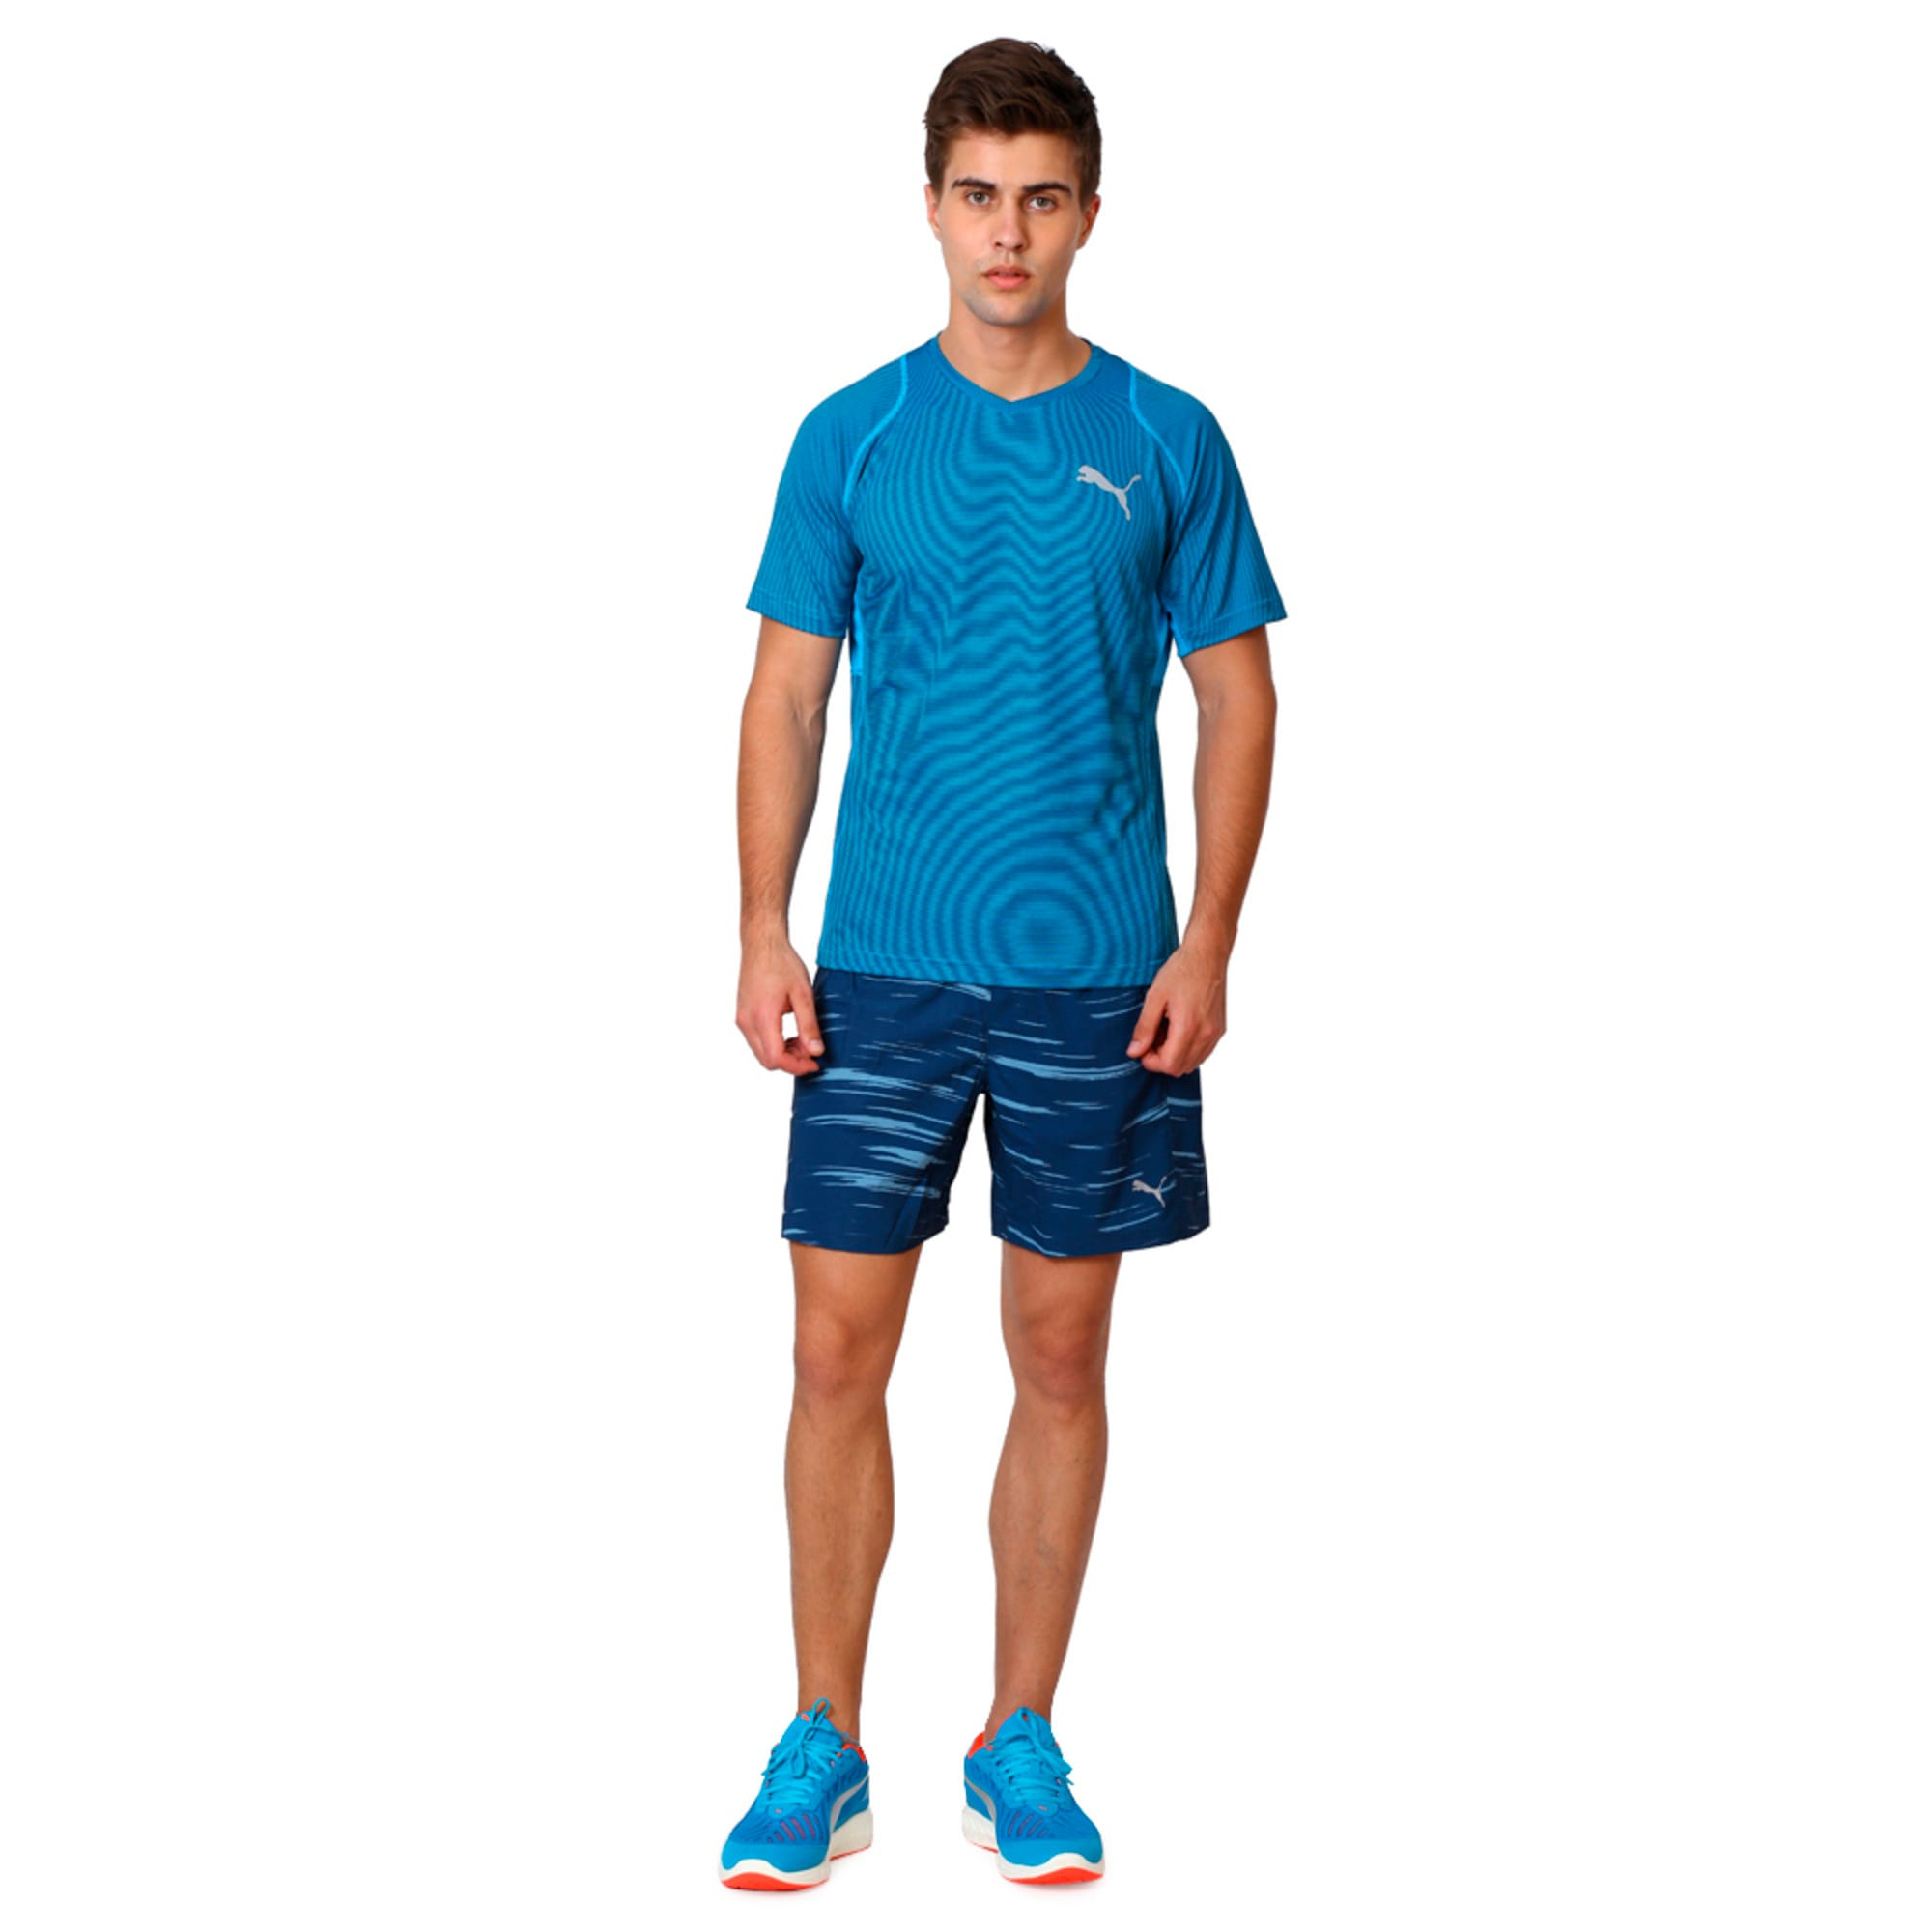 Thumbnail 3 of Active Training Vent Stripe T-Shirt, atomic blue-w/ Black, medium-IND